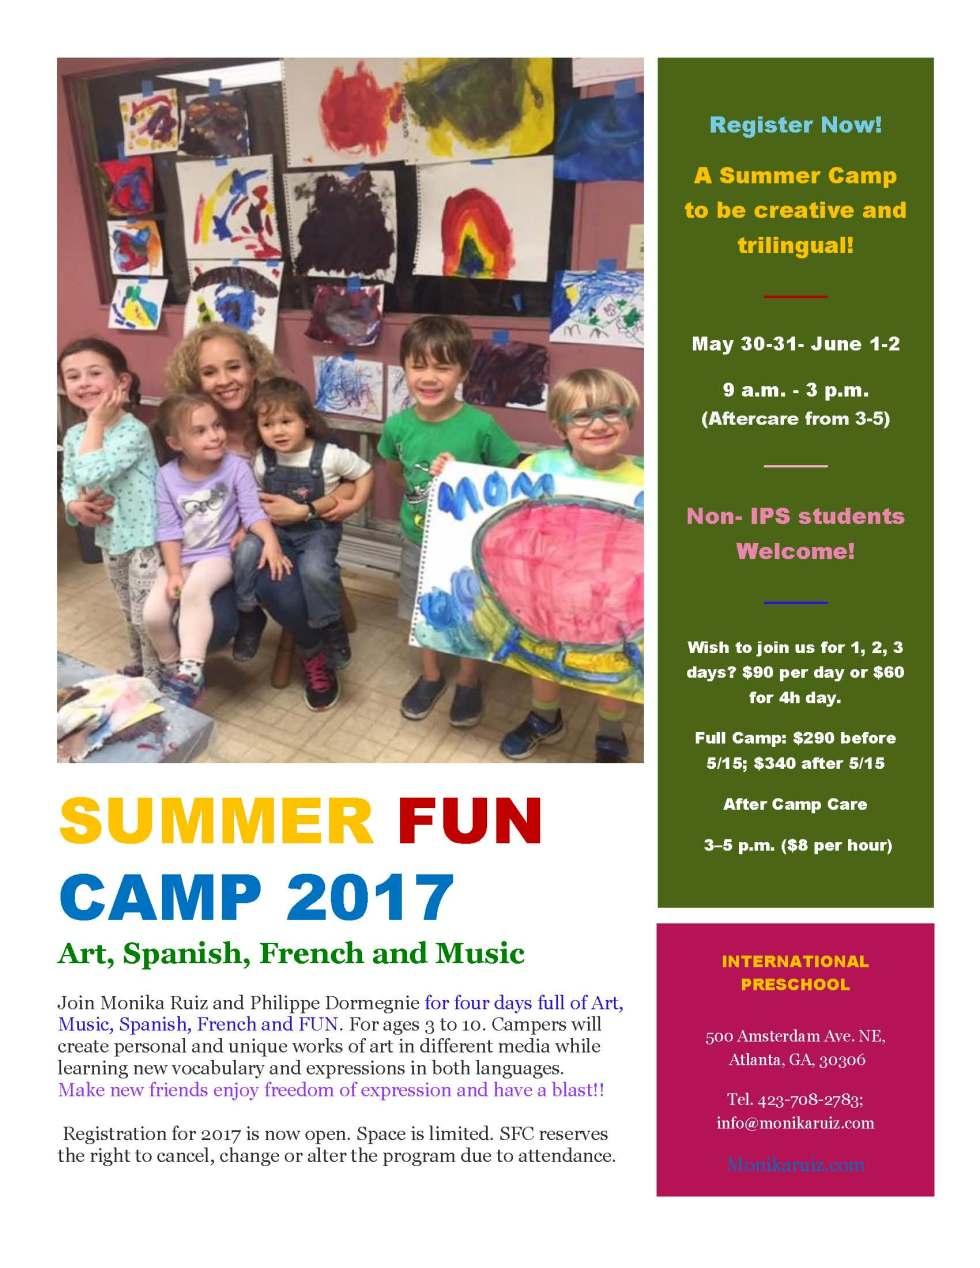 Summer Fun Camp 2017 with Monika Ruiz and Philippe Dormegnie